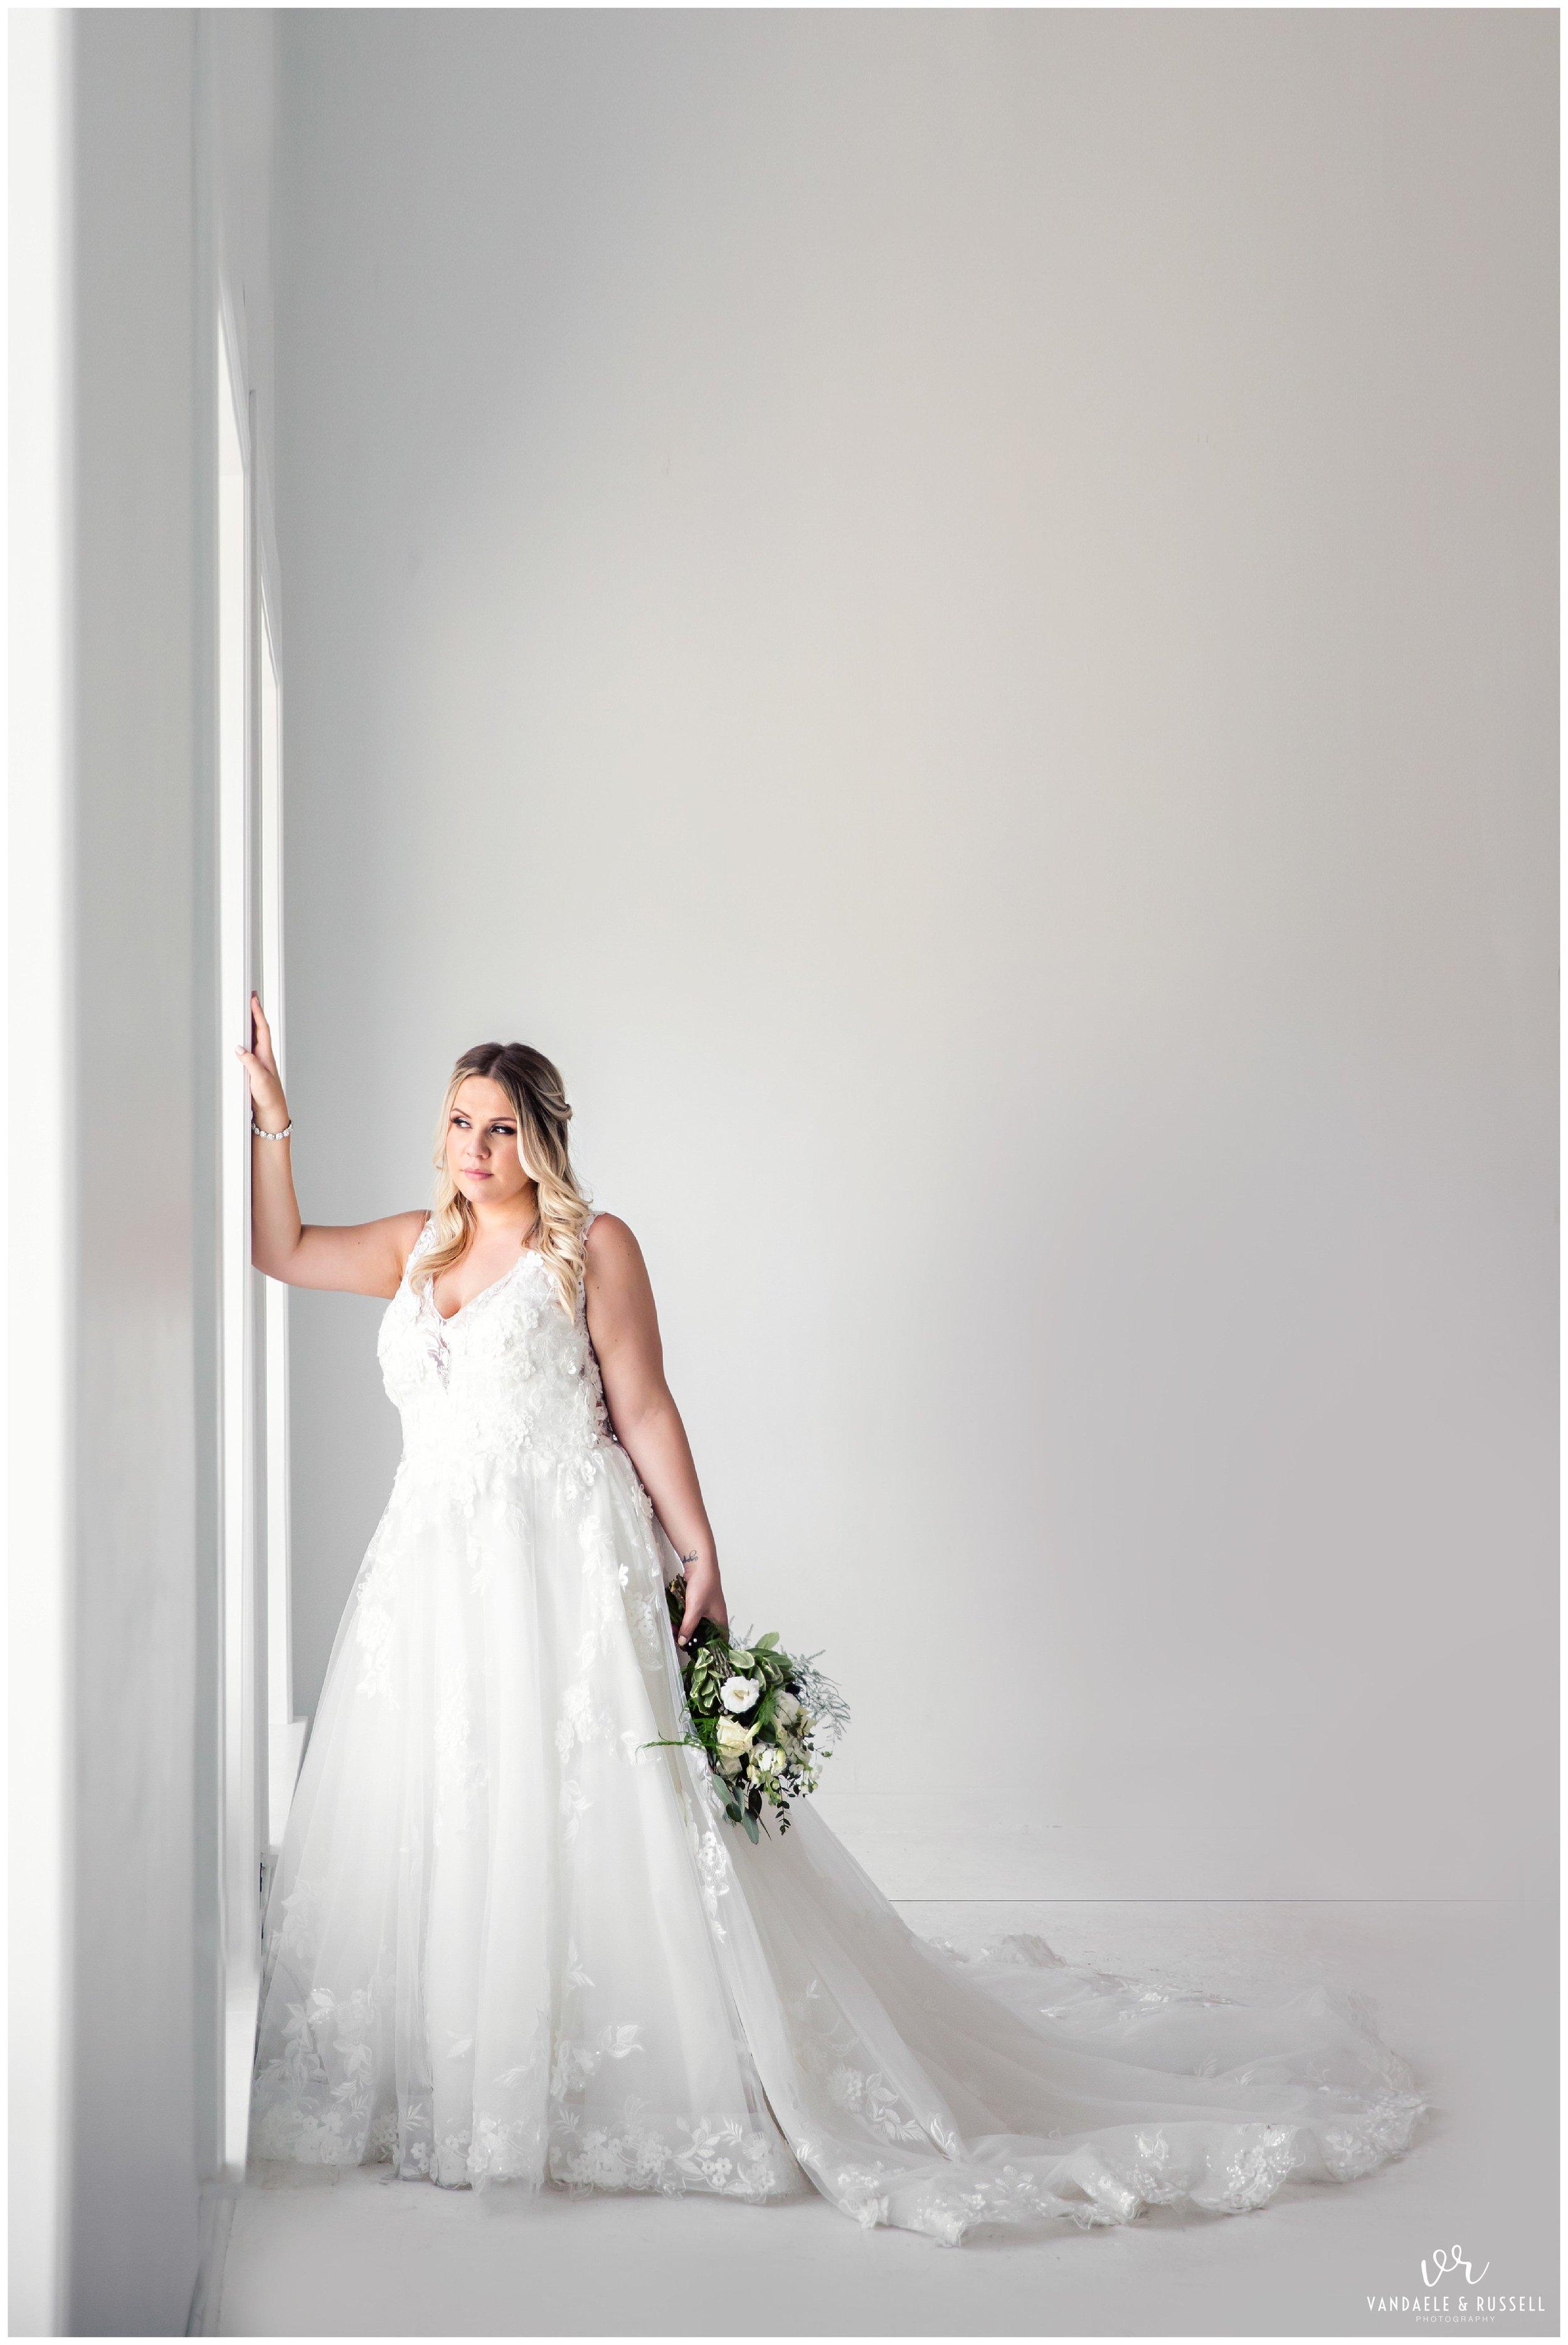 VanDaele-Russell-Wedding-Photography-London-Toronto-Ontario_0108.jpg